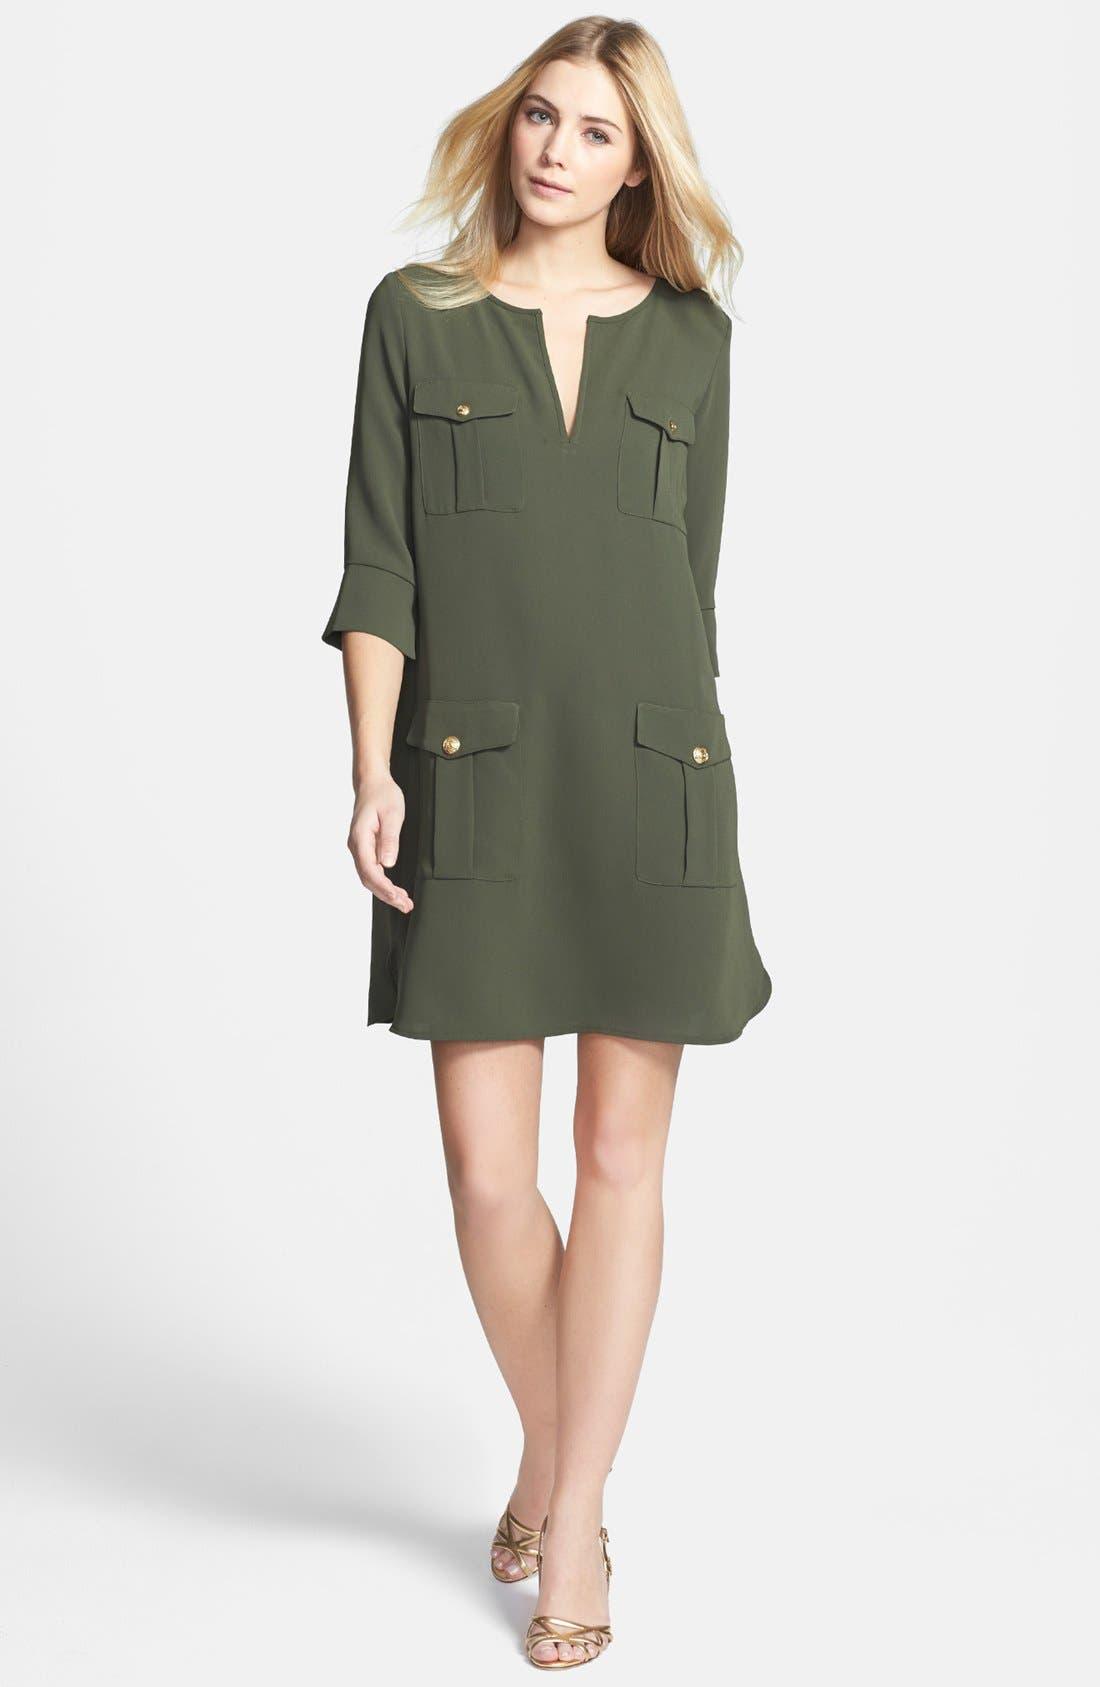 Alternate Image 1 Selected - Diane von Furstenberg 'Agness' Woven Shift Dress